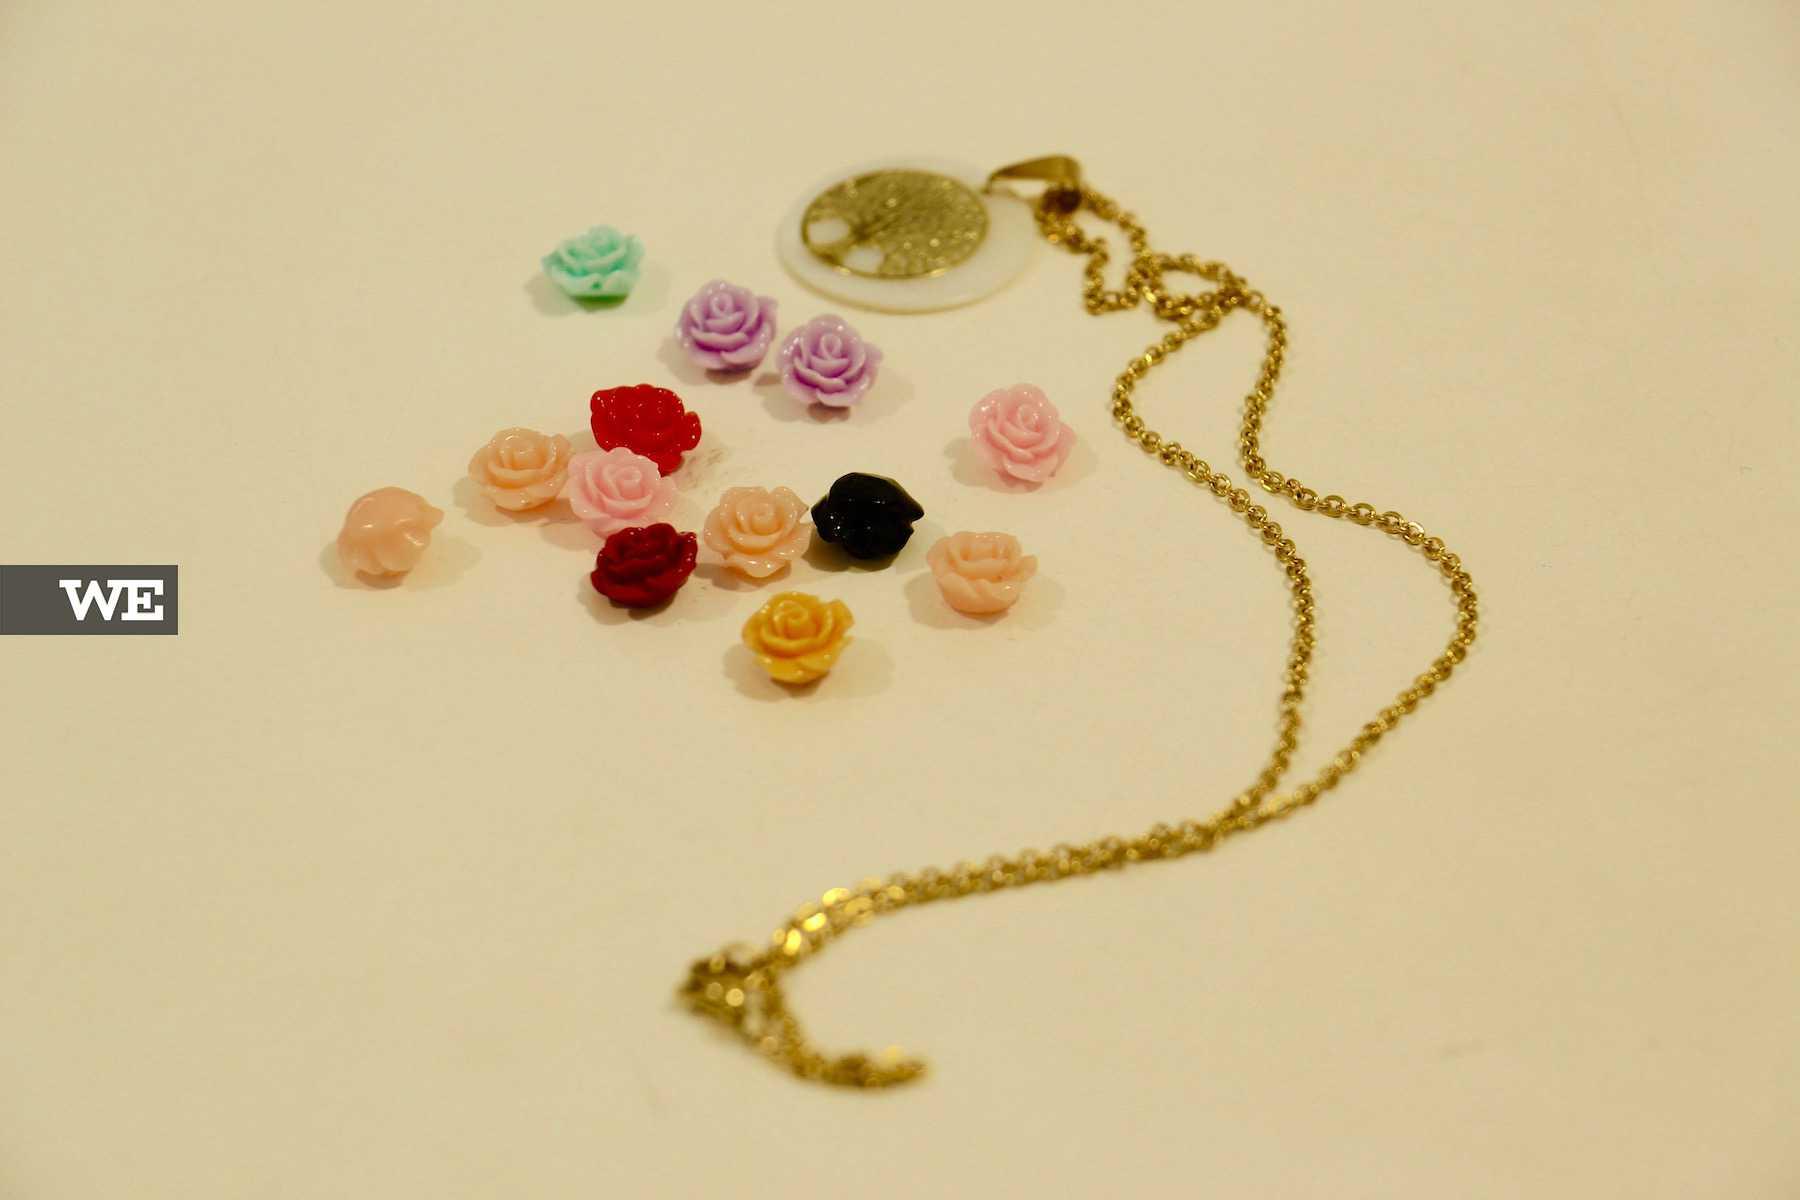 Pode personalizar a bijuteria na loja IrinasB